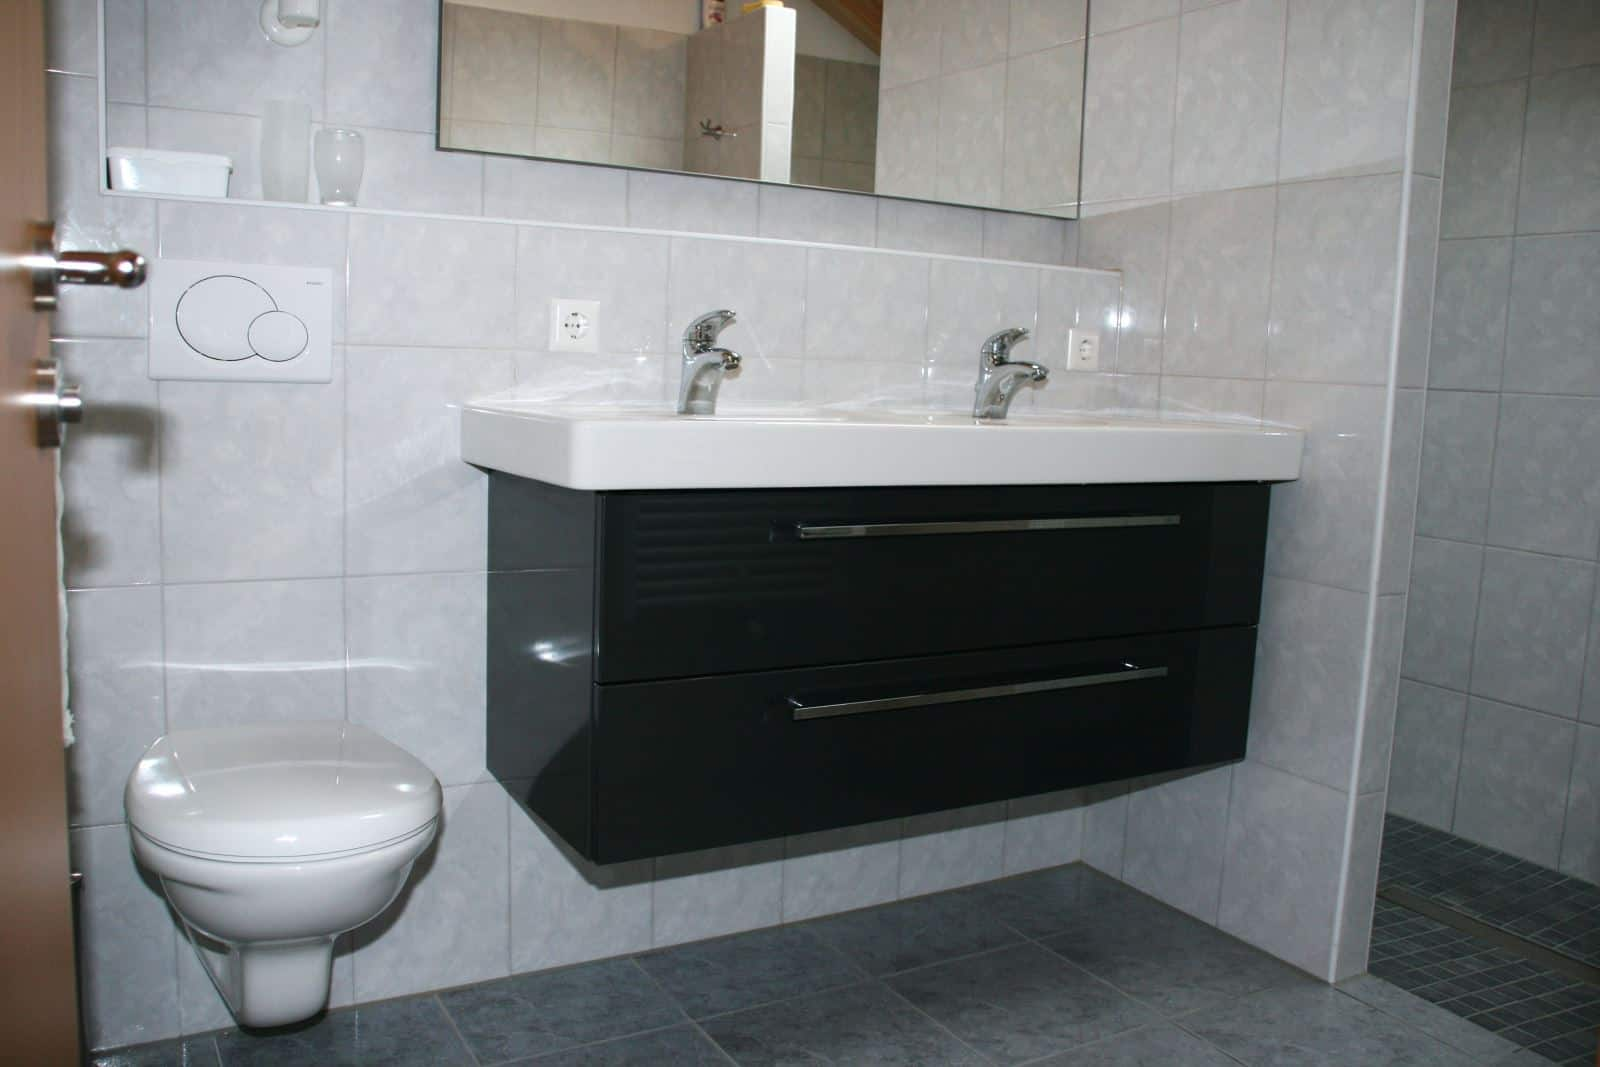 KWO villa te koop - badkamer